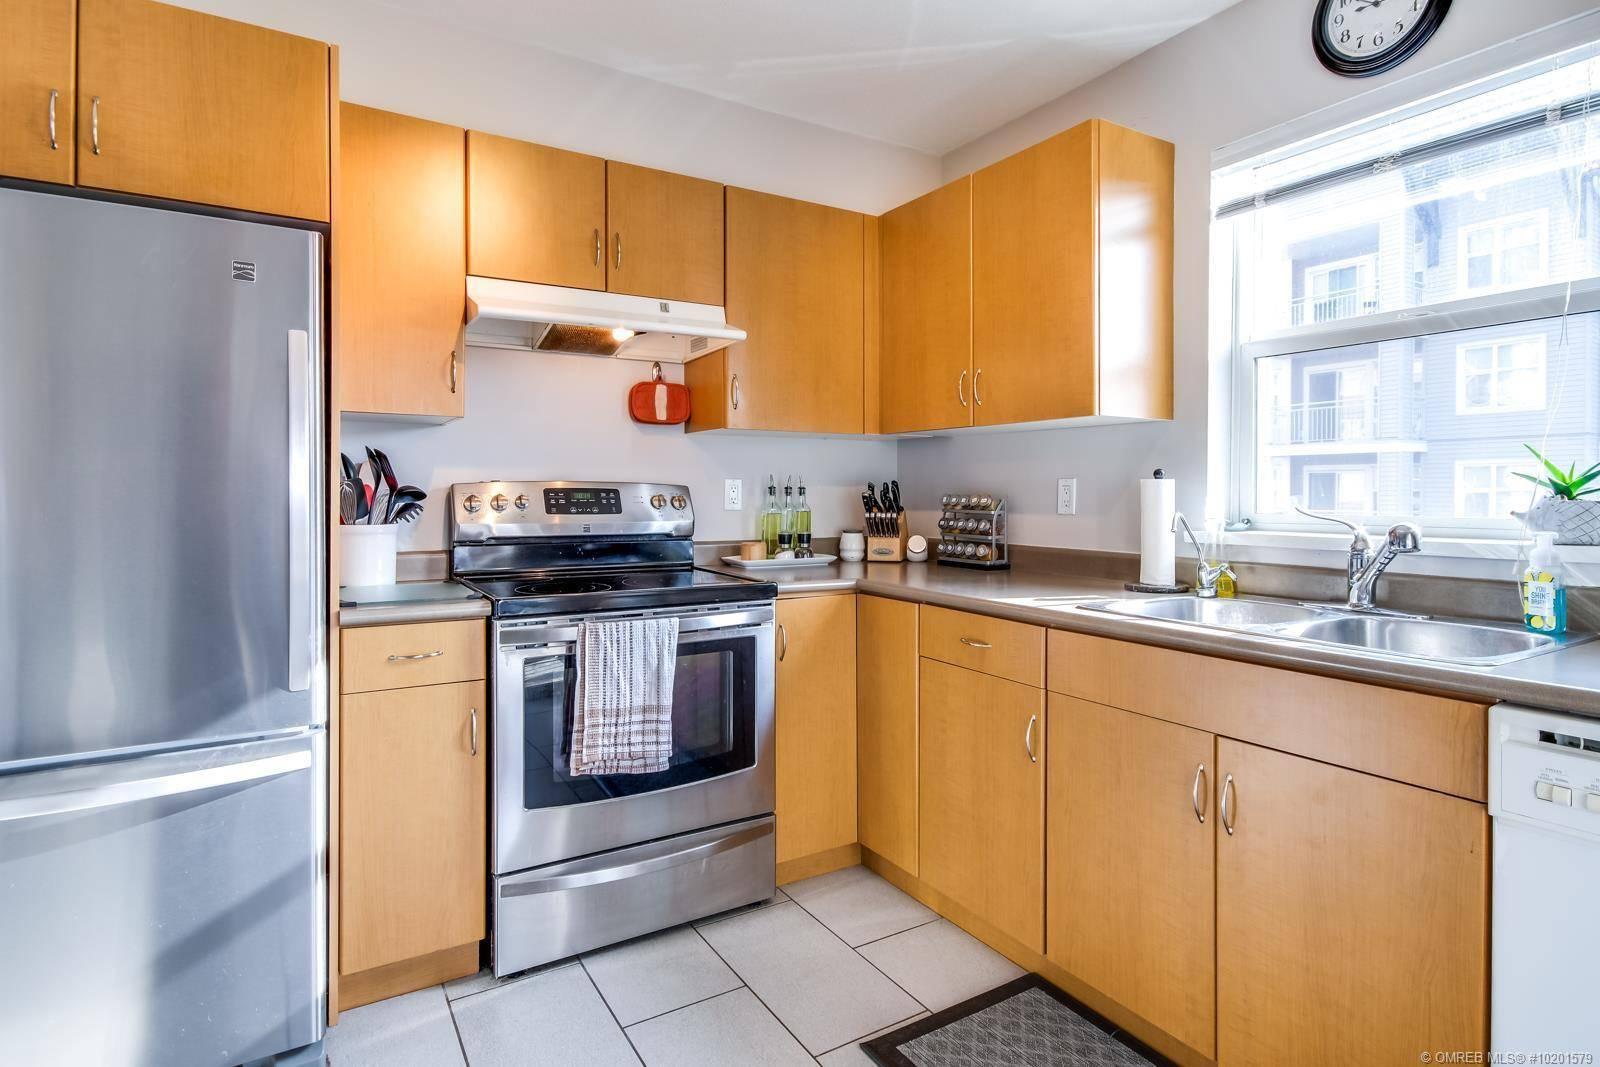 Condo for sale at 555 Yates Rd Unit 215 Kelowna British Columbia - MLS: 10201579